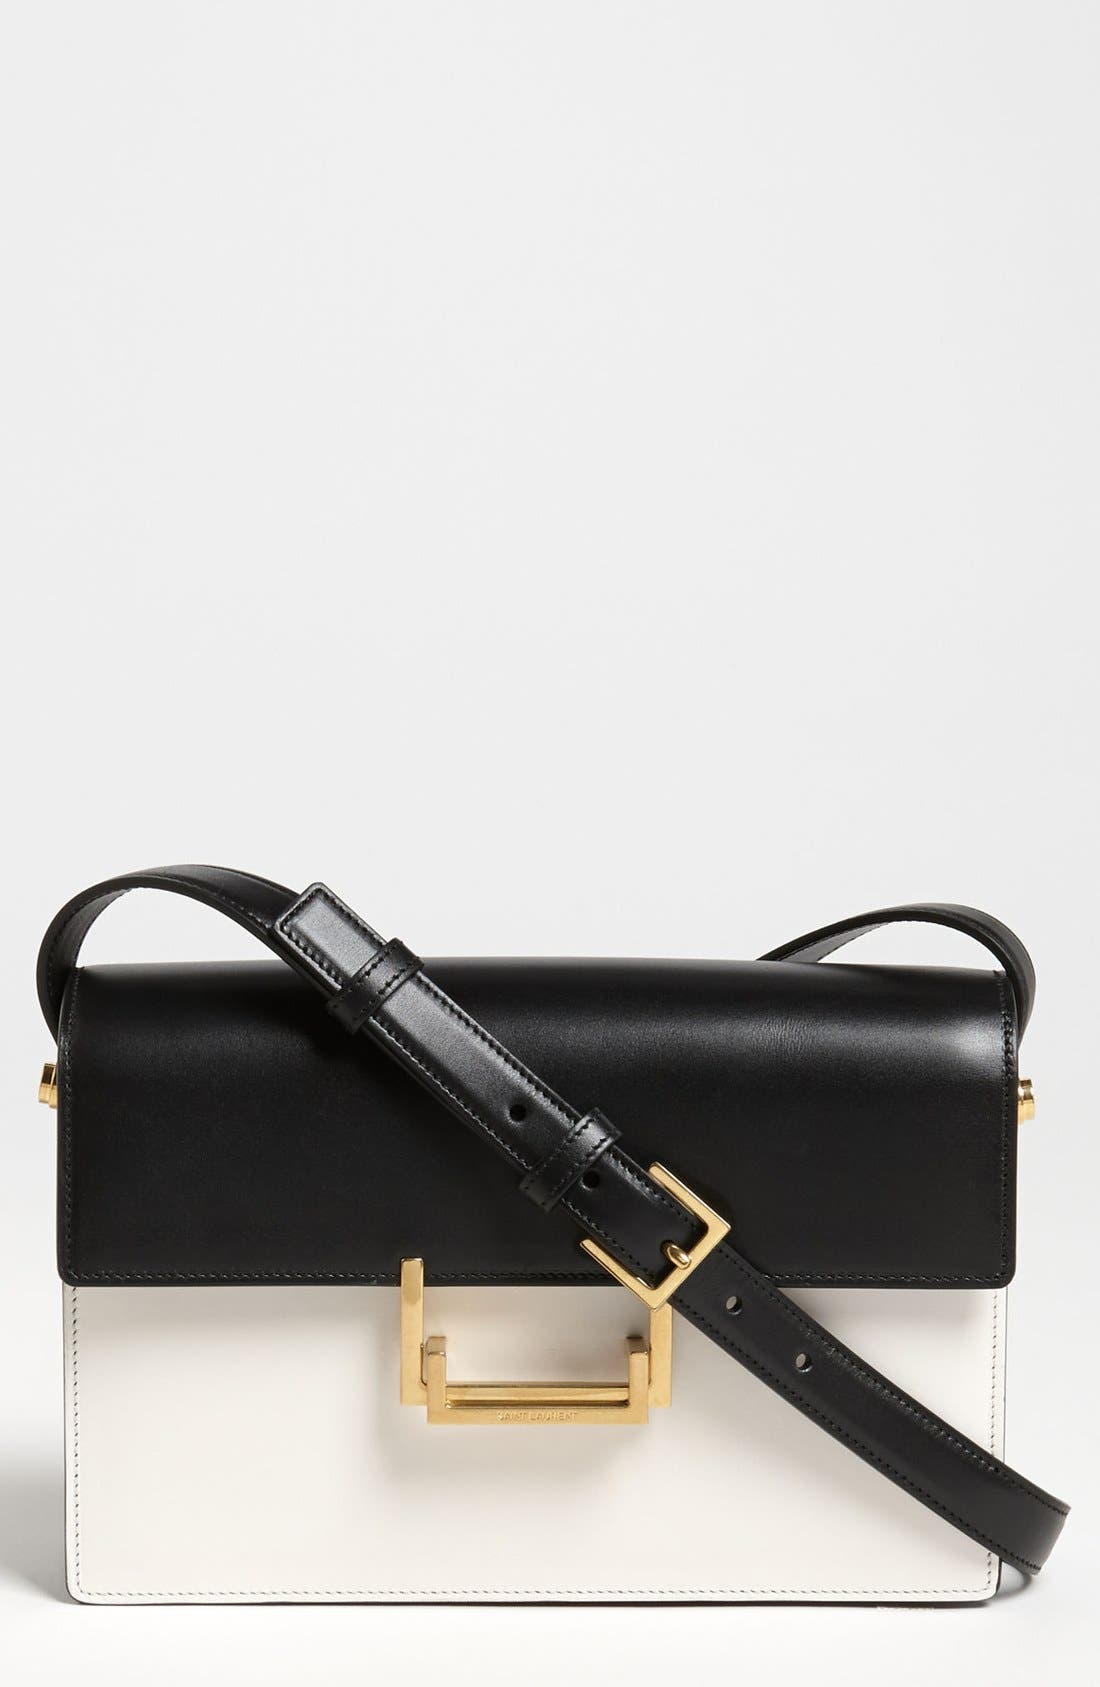 Alternate Image 1 Selected - Saint Laurent 'Lulu Classique' Leather Shoulder Bag